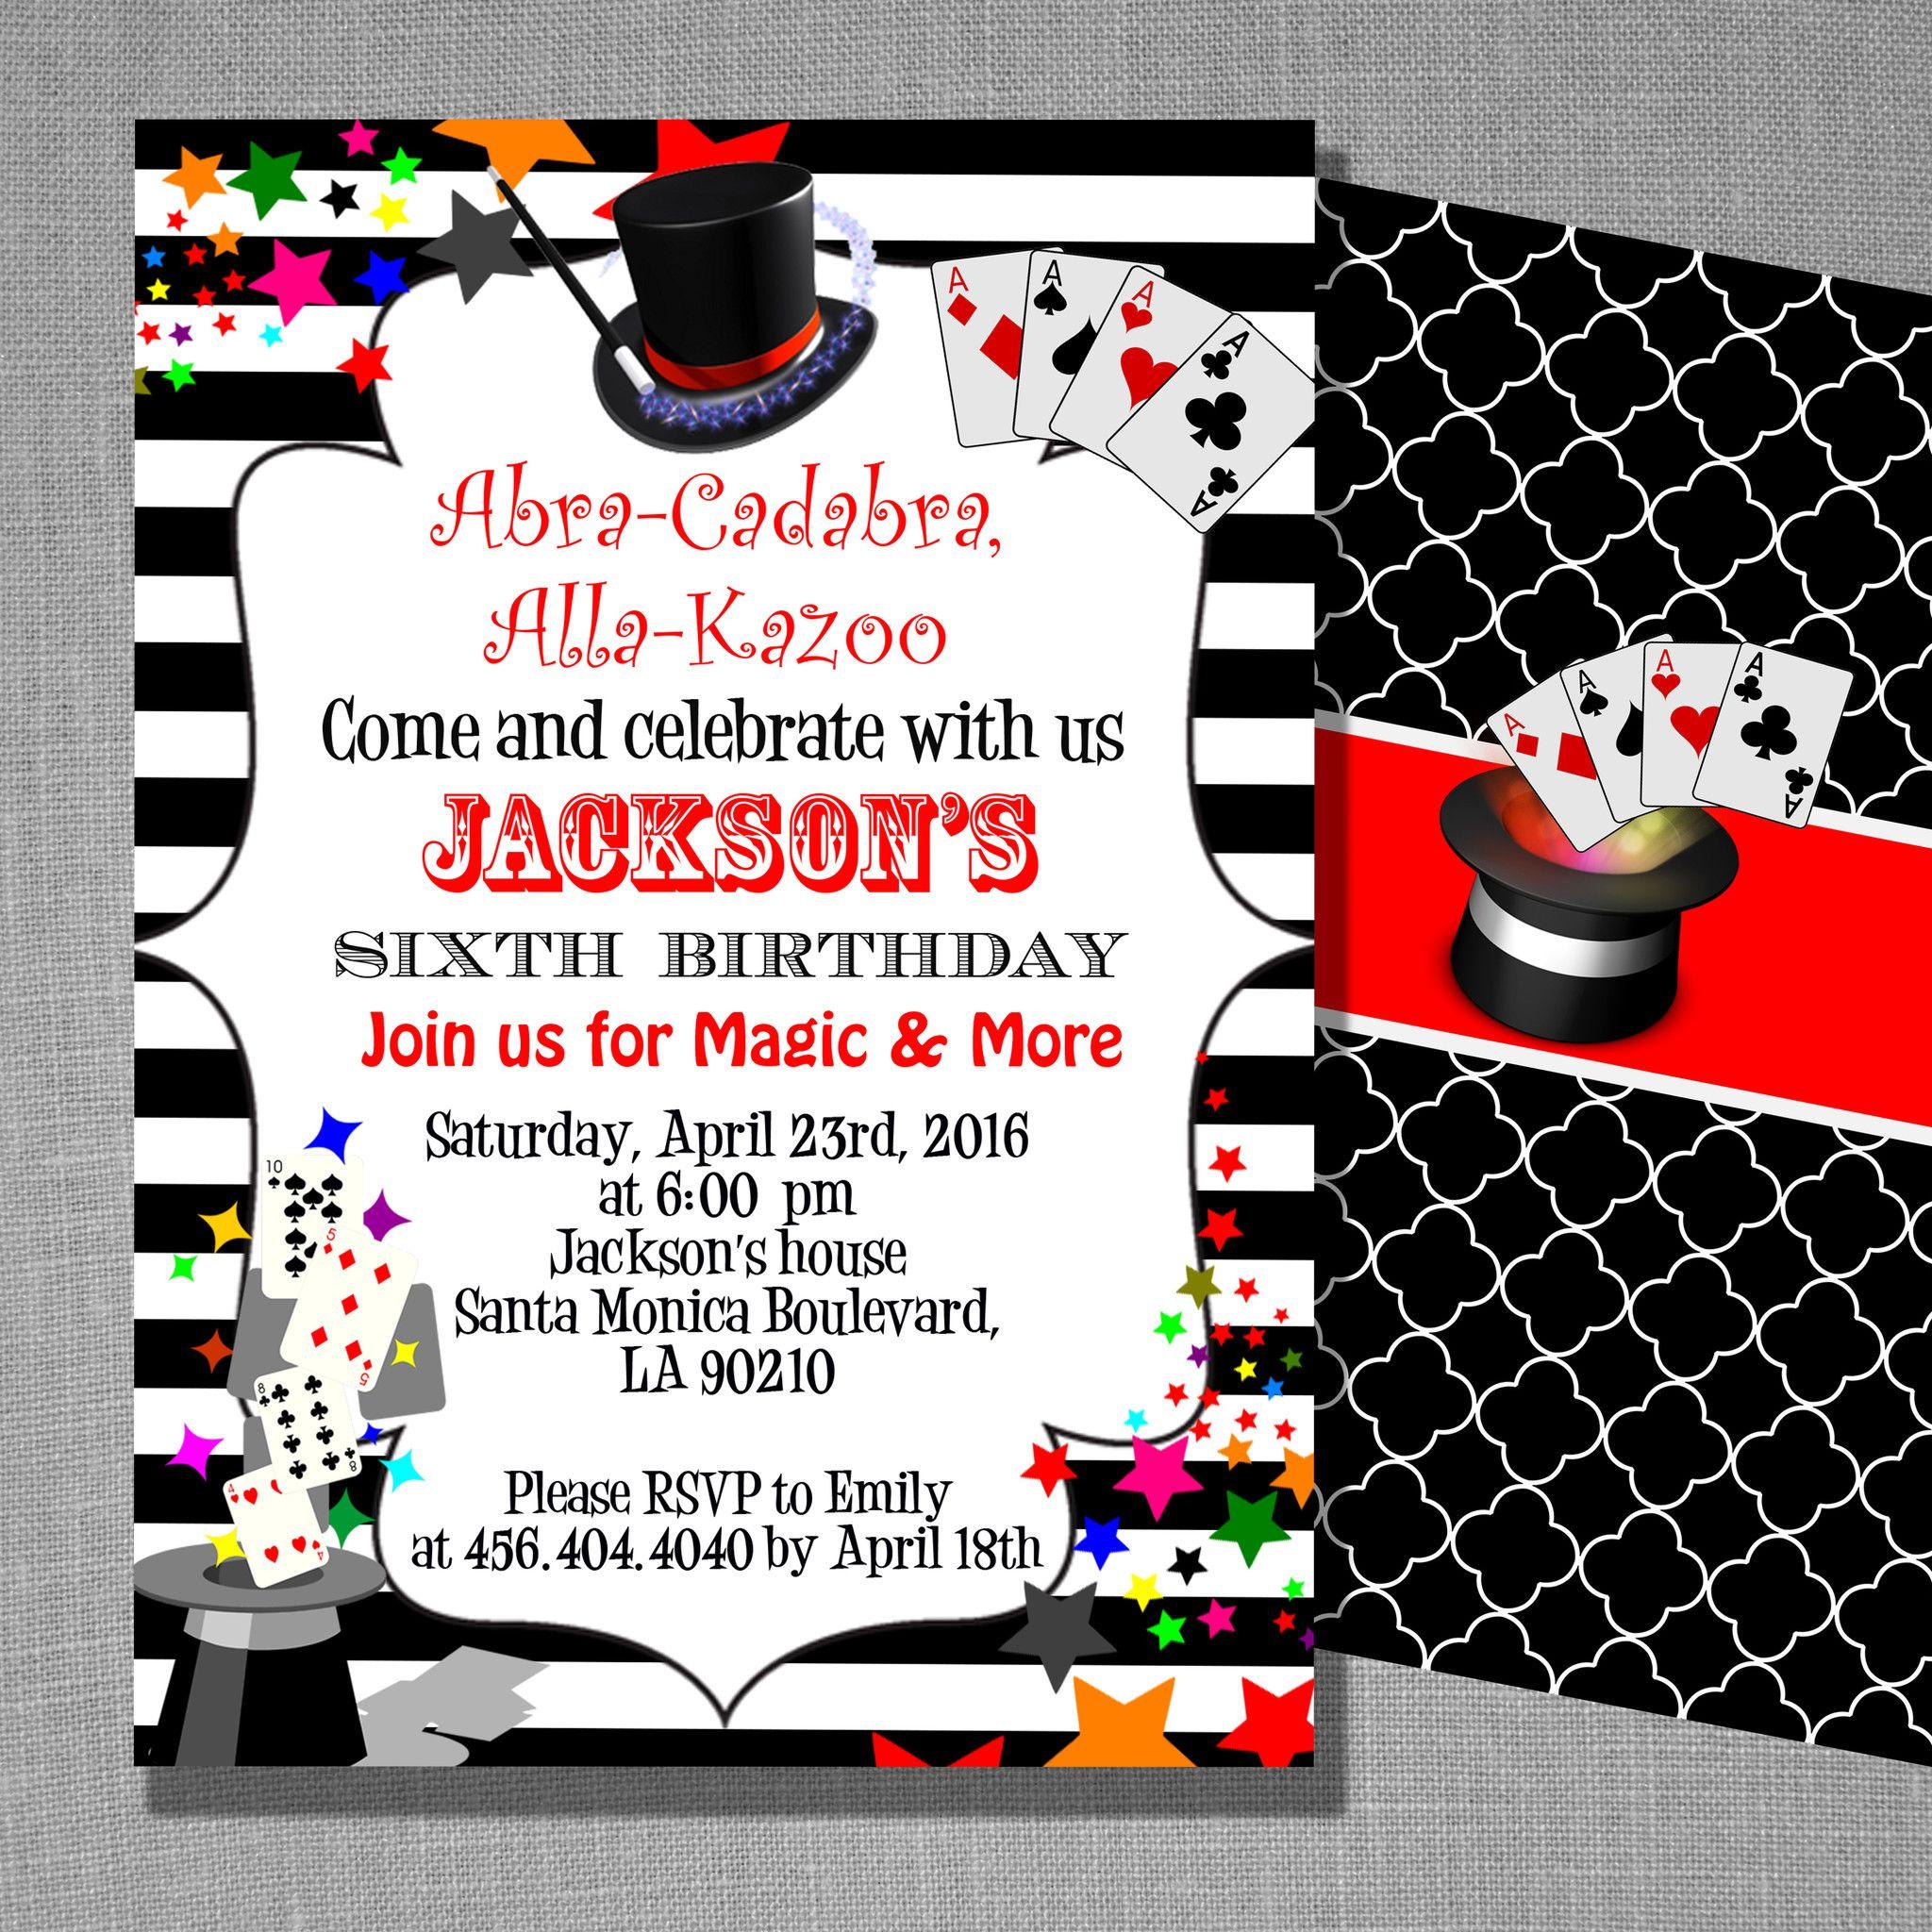 Magic birthday party invitation templates | Magic Invitations ...